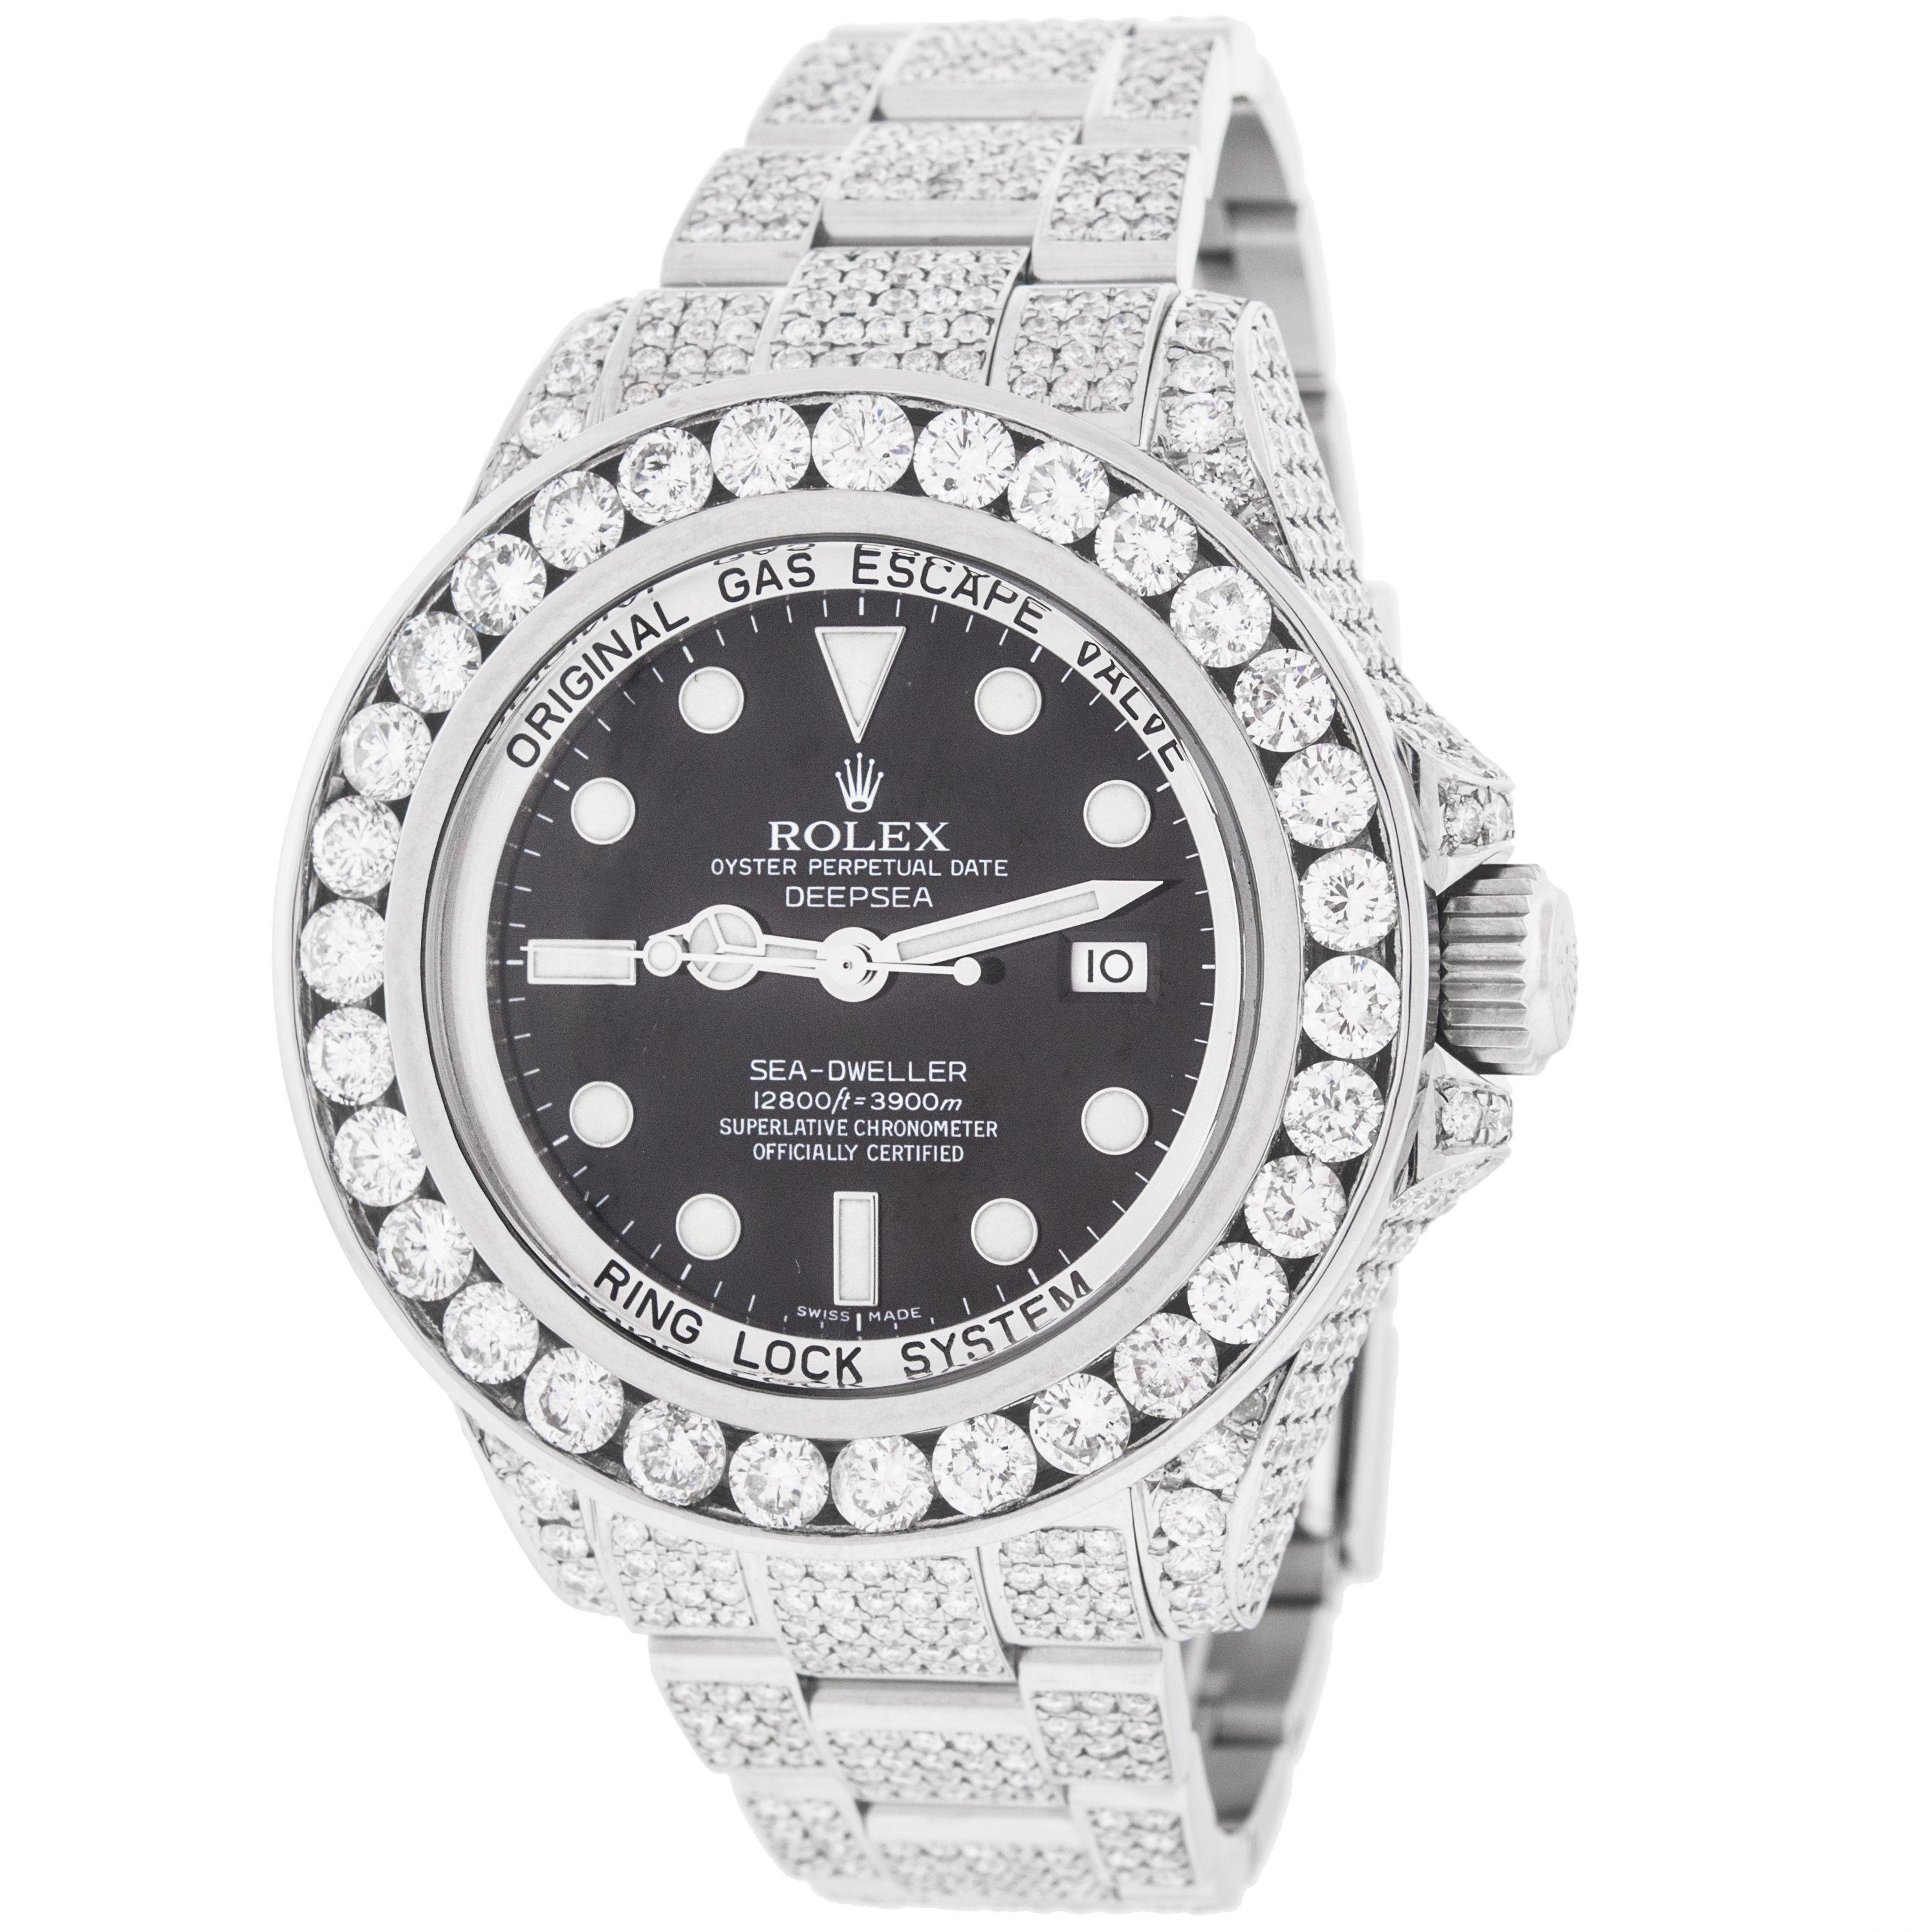 Rolex Sea-Dweller Deepsea 116660 Custom 24ct Diamonds Stainless Steel Automatic Men's Watch